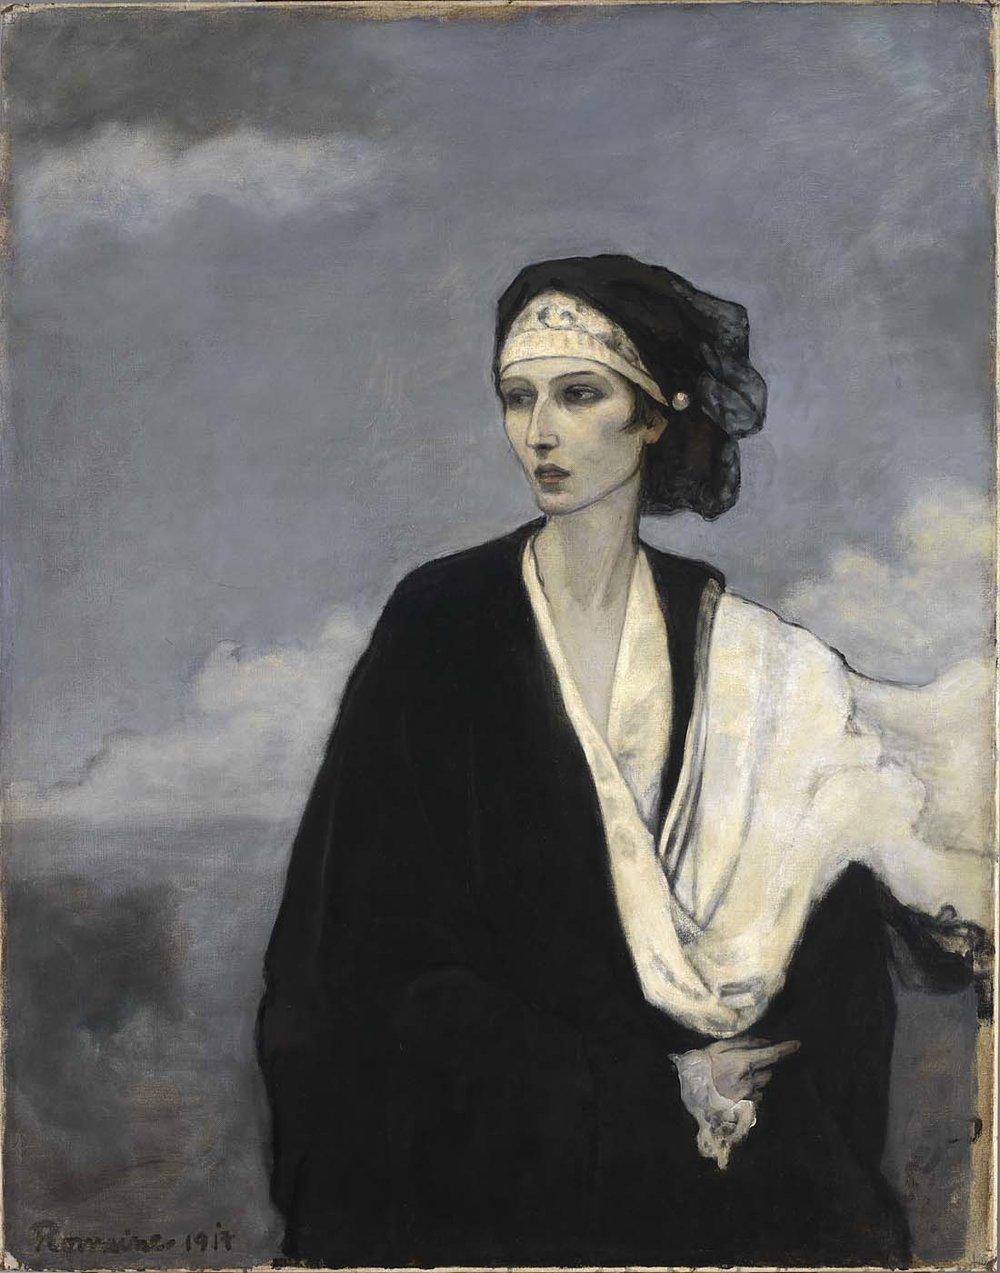 Romaine Brooks,  Ida Rubinstein , 1917, Oil on Canvas, Courtesy of the Smithsonian American Art Museum.